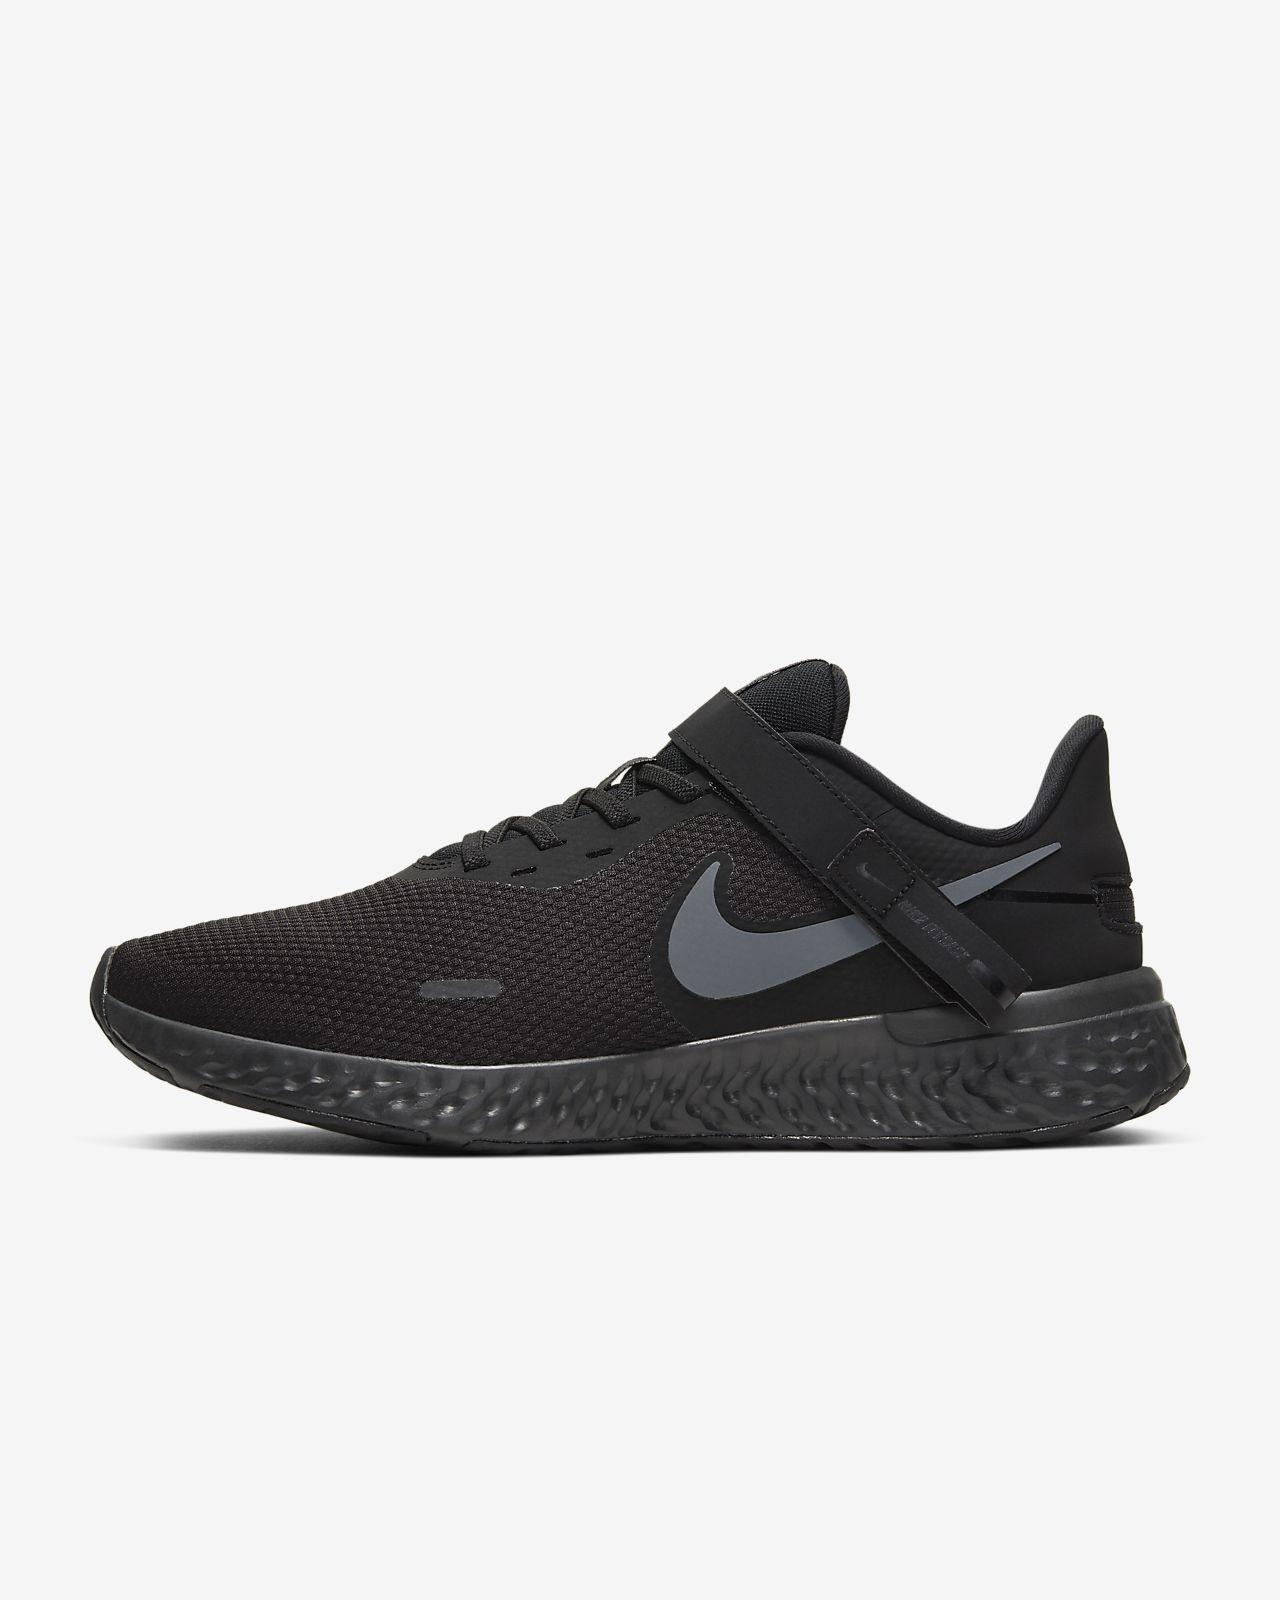 Zapatillas Nike Mujer Rebajas Nike Revolution 3 FlyEase